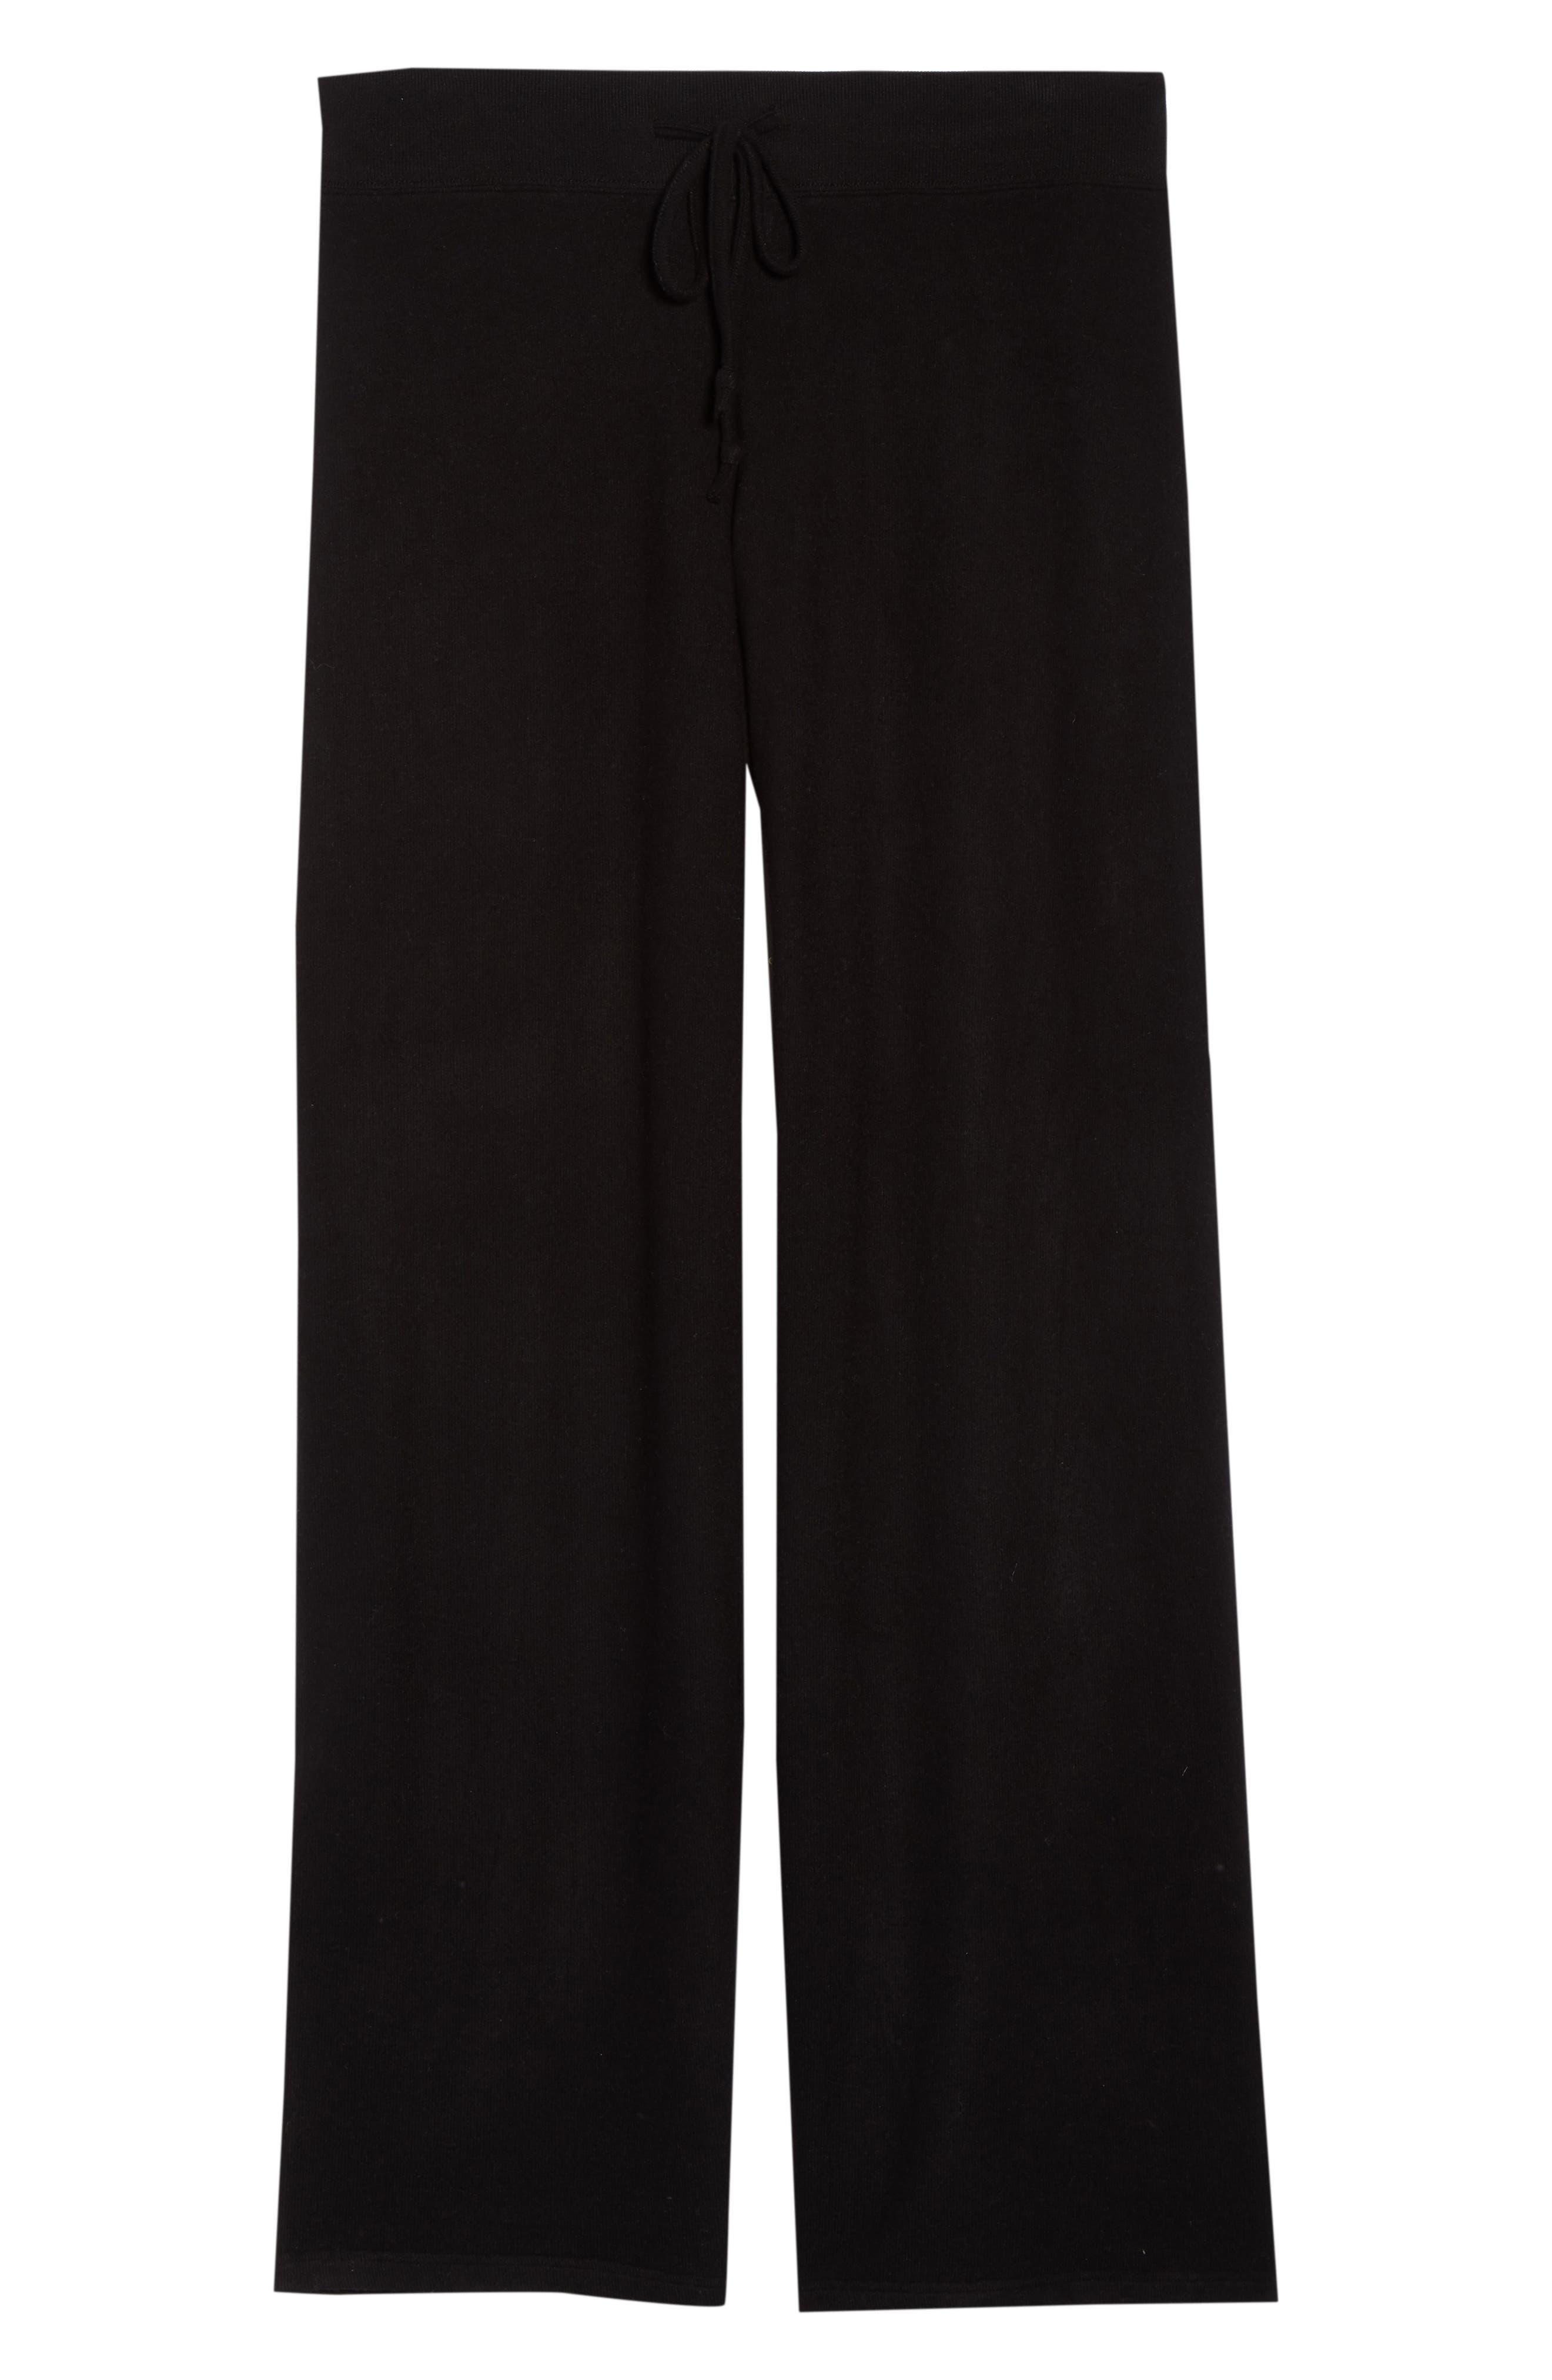 Main Image - Make + Model 'Best Boyfriend' Brushed Hacci Lounge Pants (Plus Size)